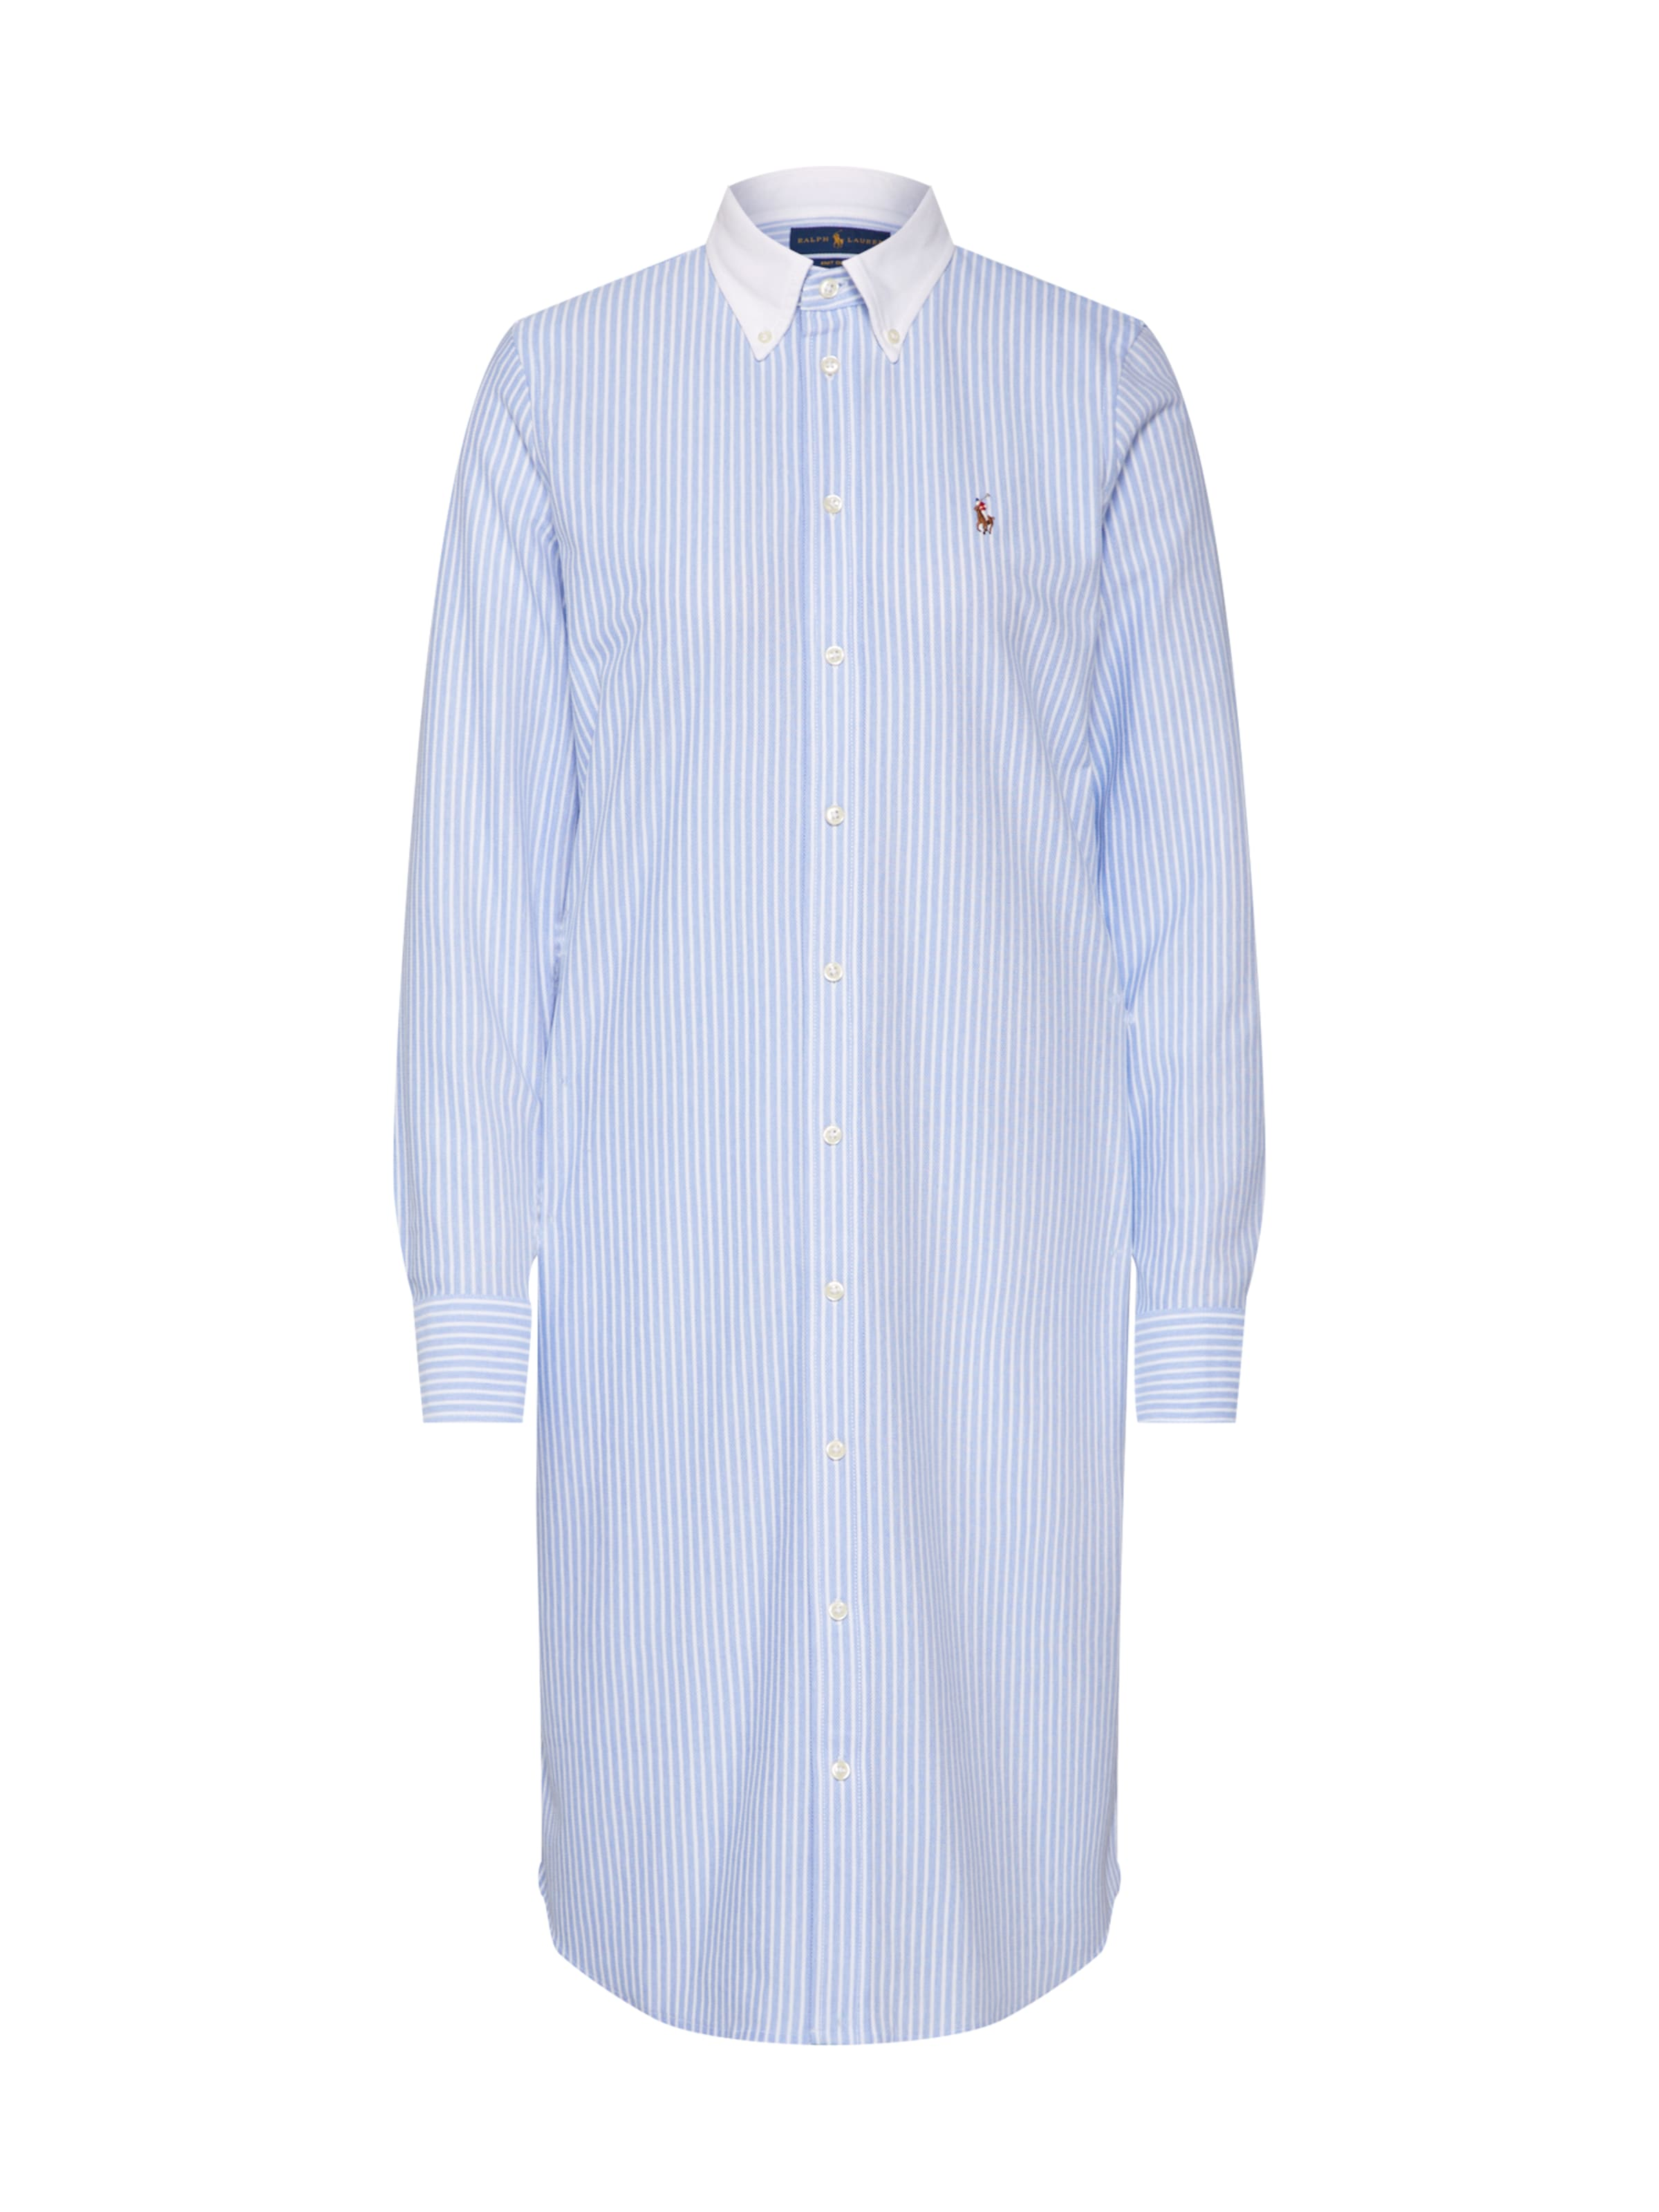 En Lauren Ralph BleuBlanc Robe chemise Polo qzVGSUMLp